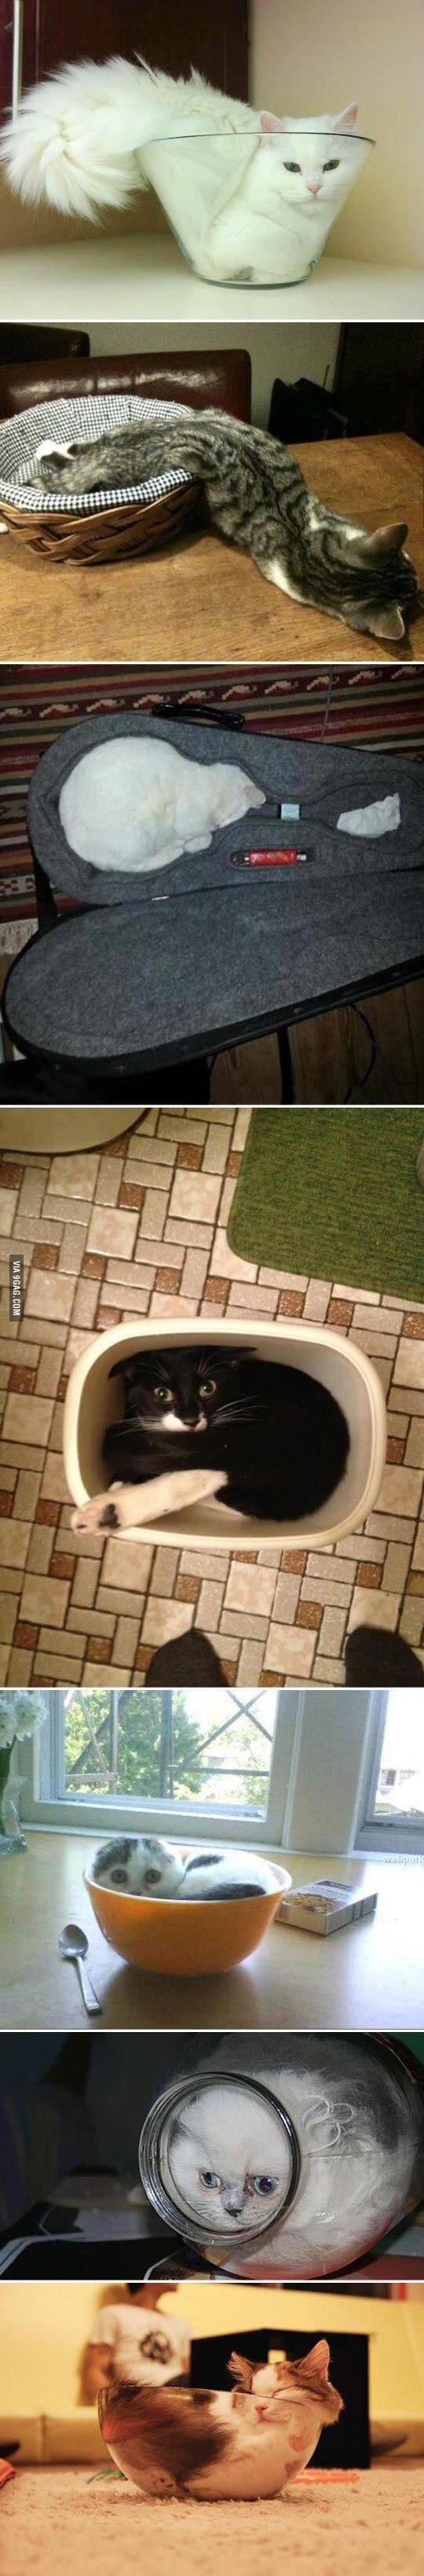 kvapalné mačky